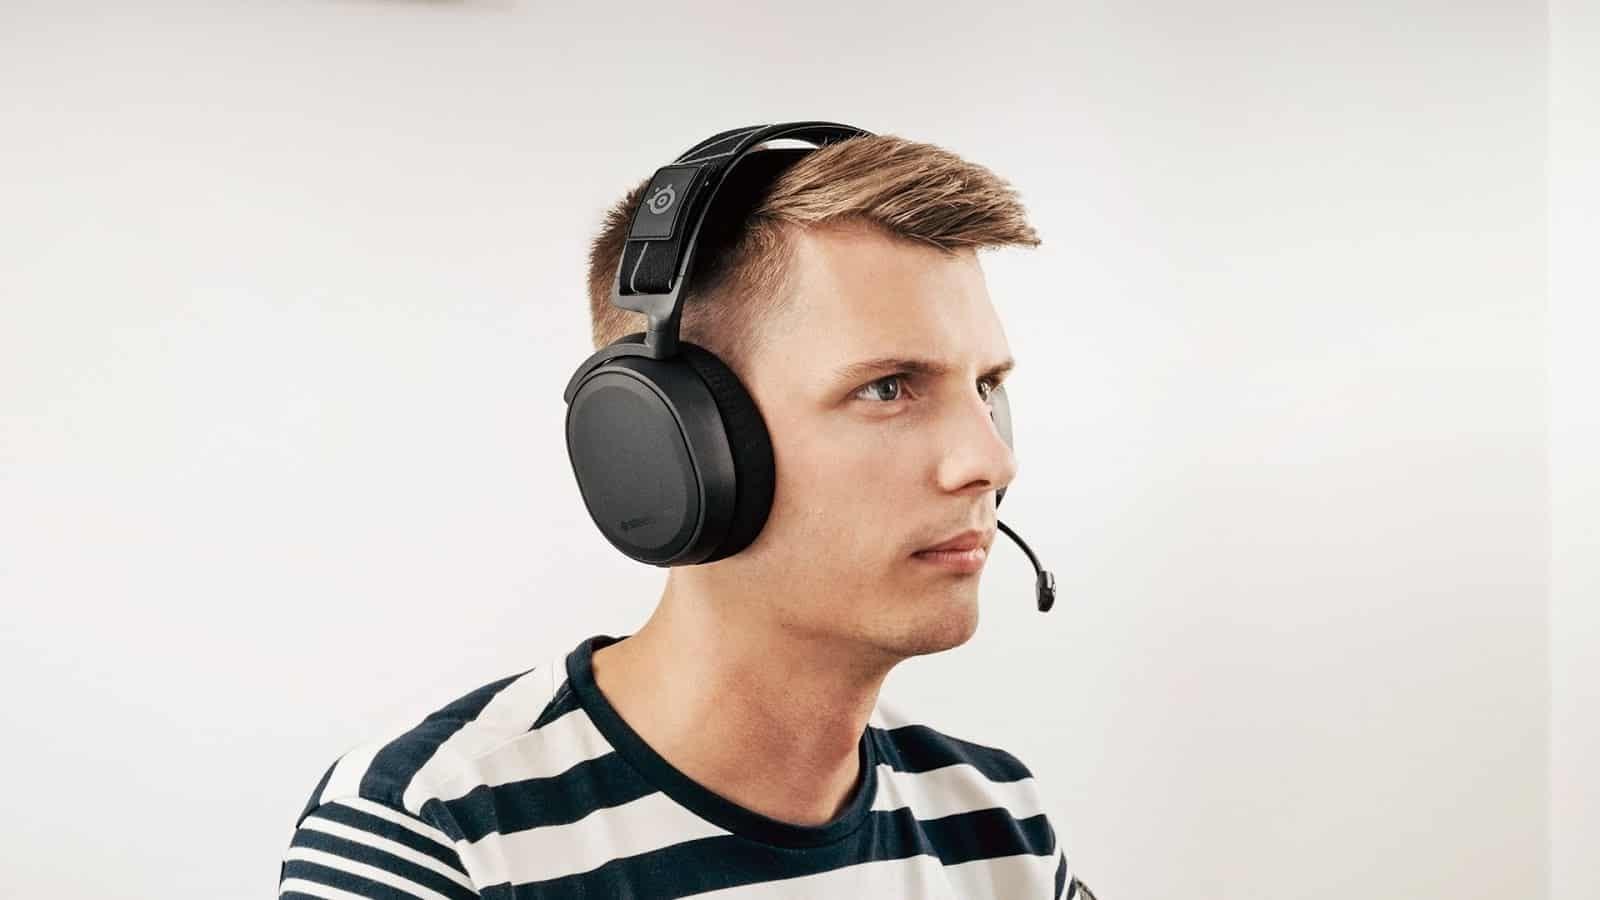 Best Headphones for gaming in 2021